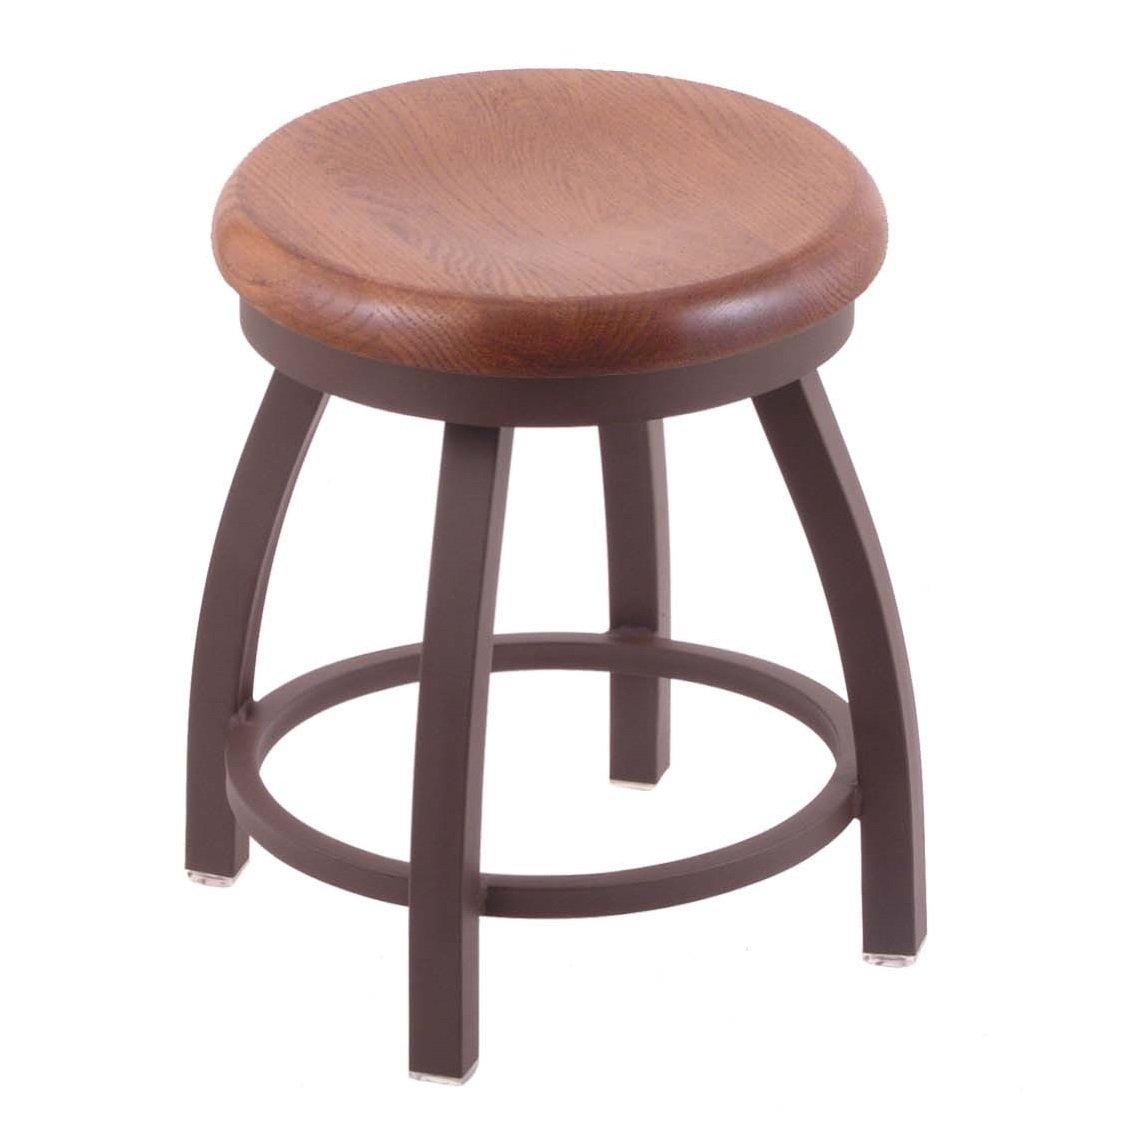 Holland Bar Stool Co. 802 Misha Vanity Stool with Bronze Finish and Swivel Seat, 18'', Medium Oak by Holland Bar Stool